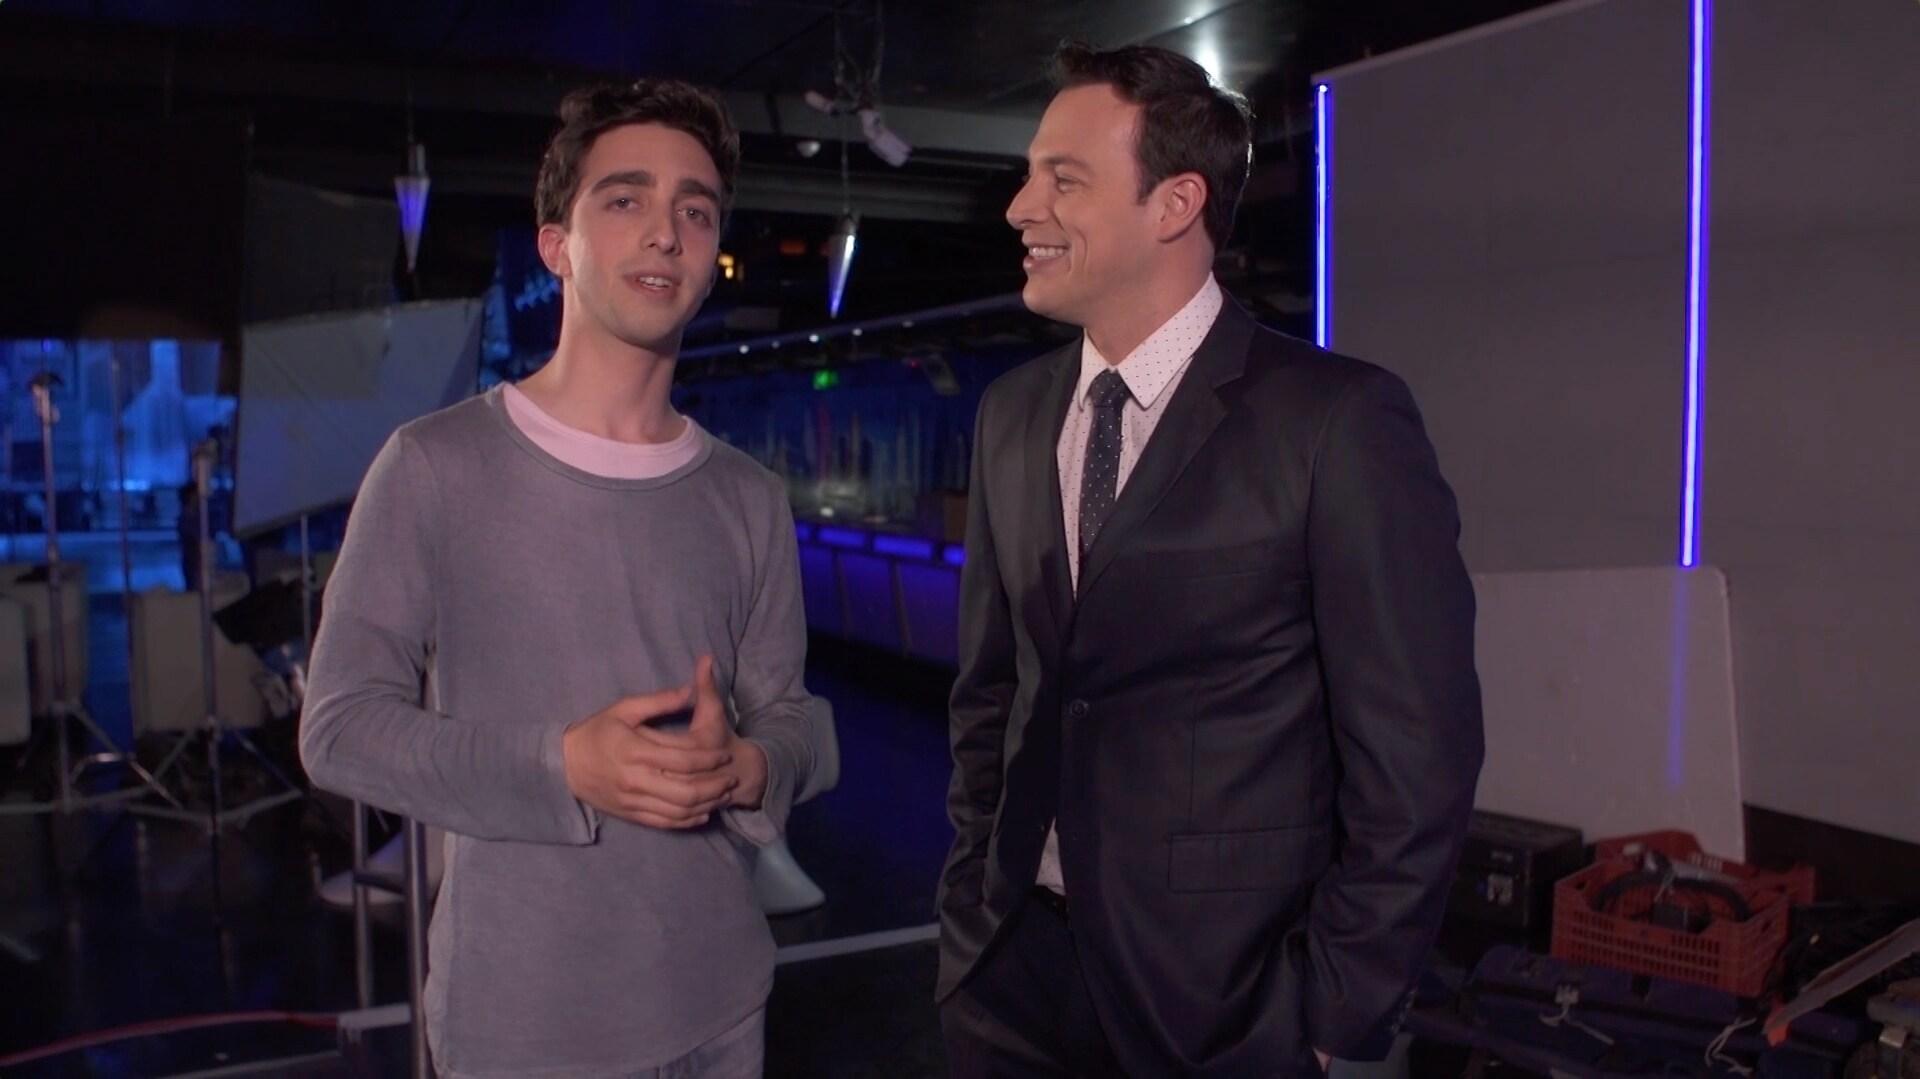 Javi entrevista a Diego Guevara - Backstage O11CE